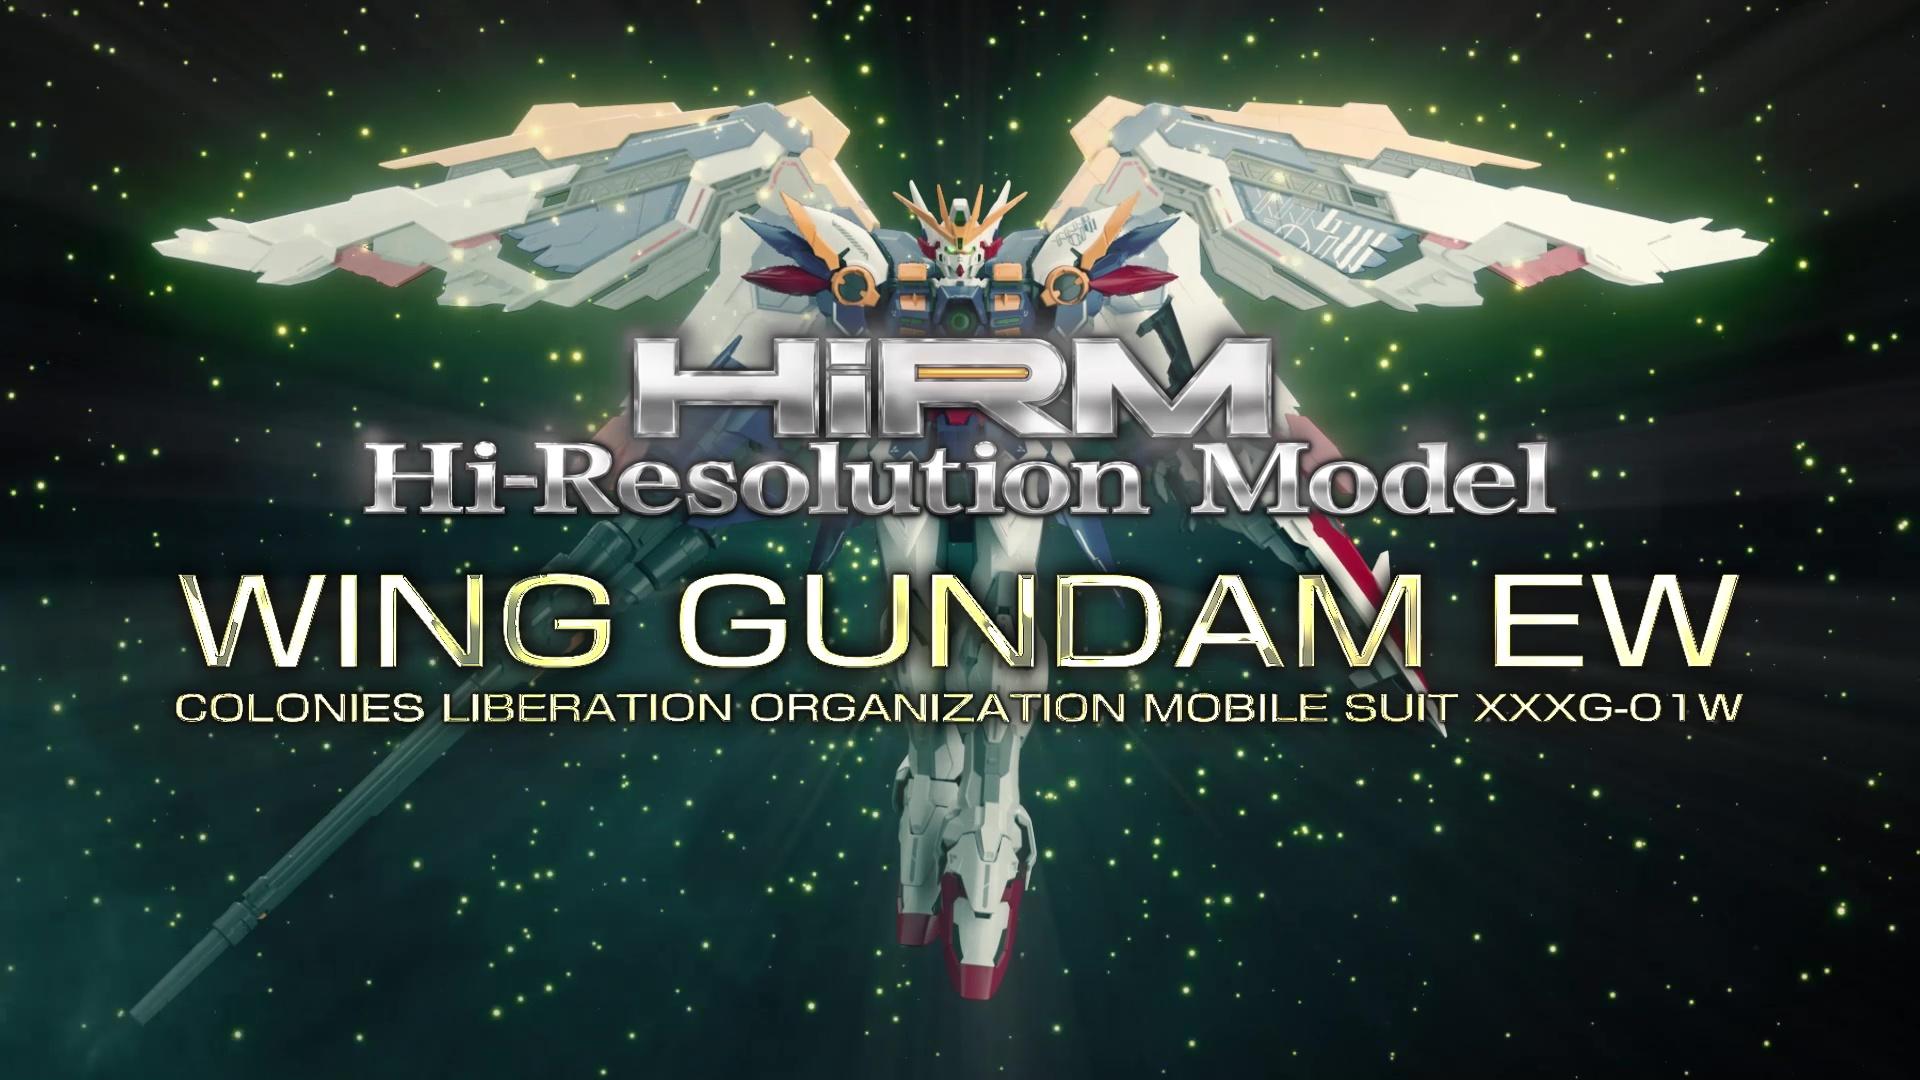 Gundaminfo The Official Gundam News And Video Portal Bandai Original Model Kits Sd V 20181012 Fri